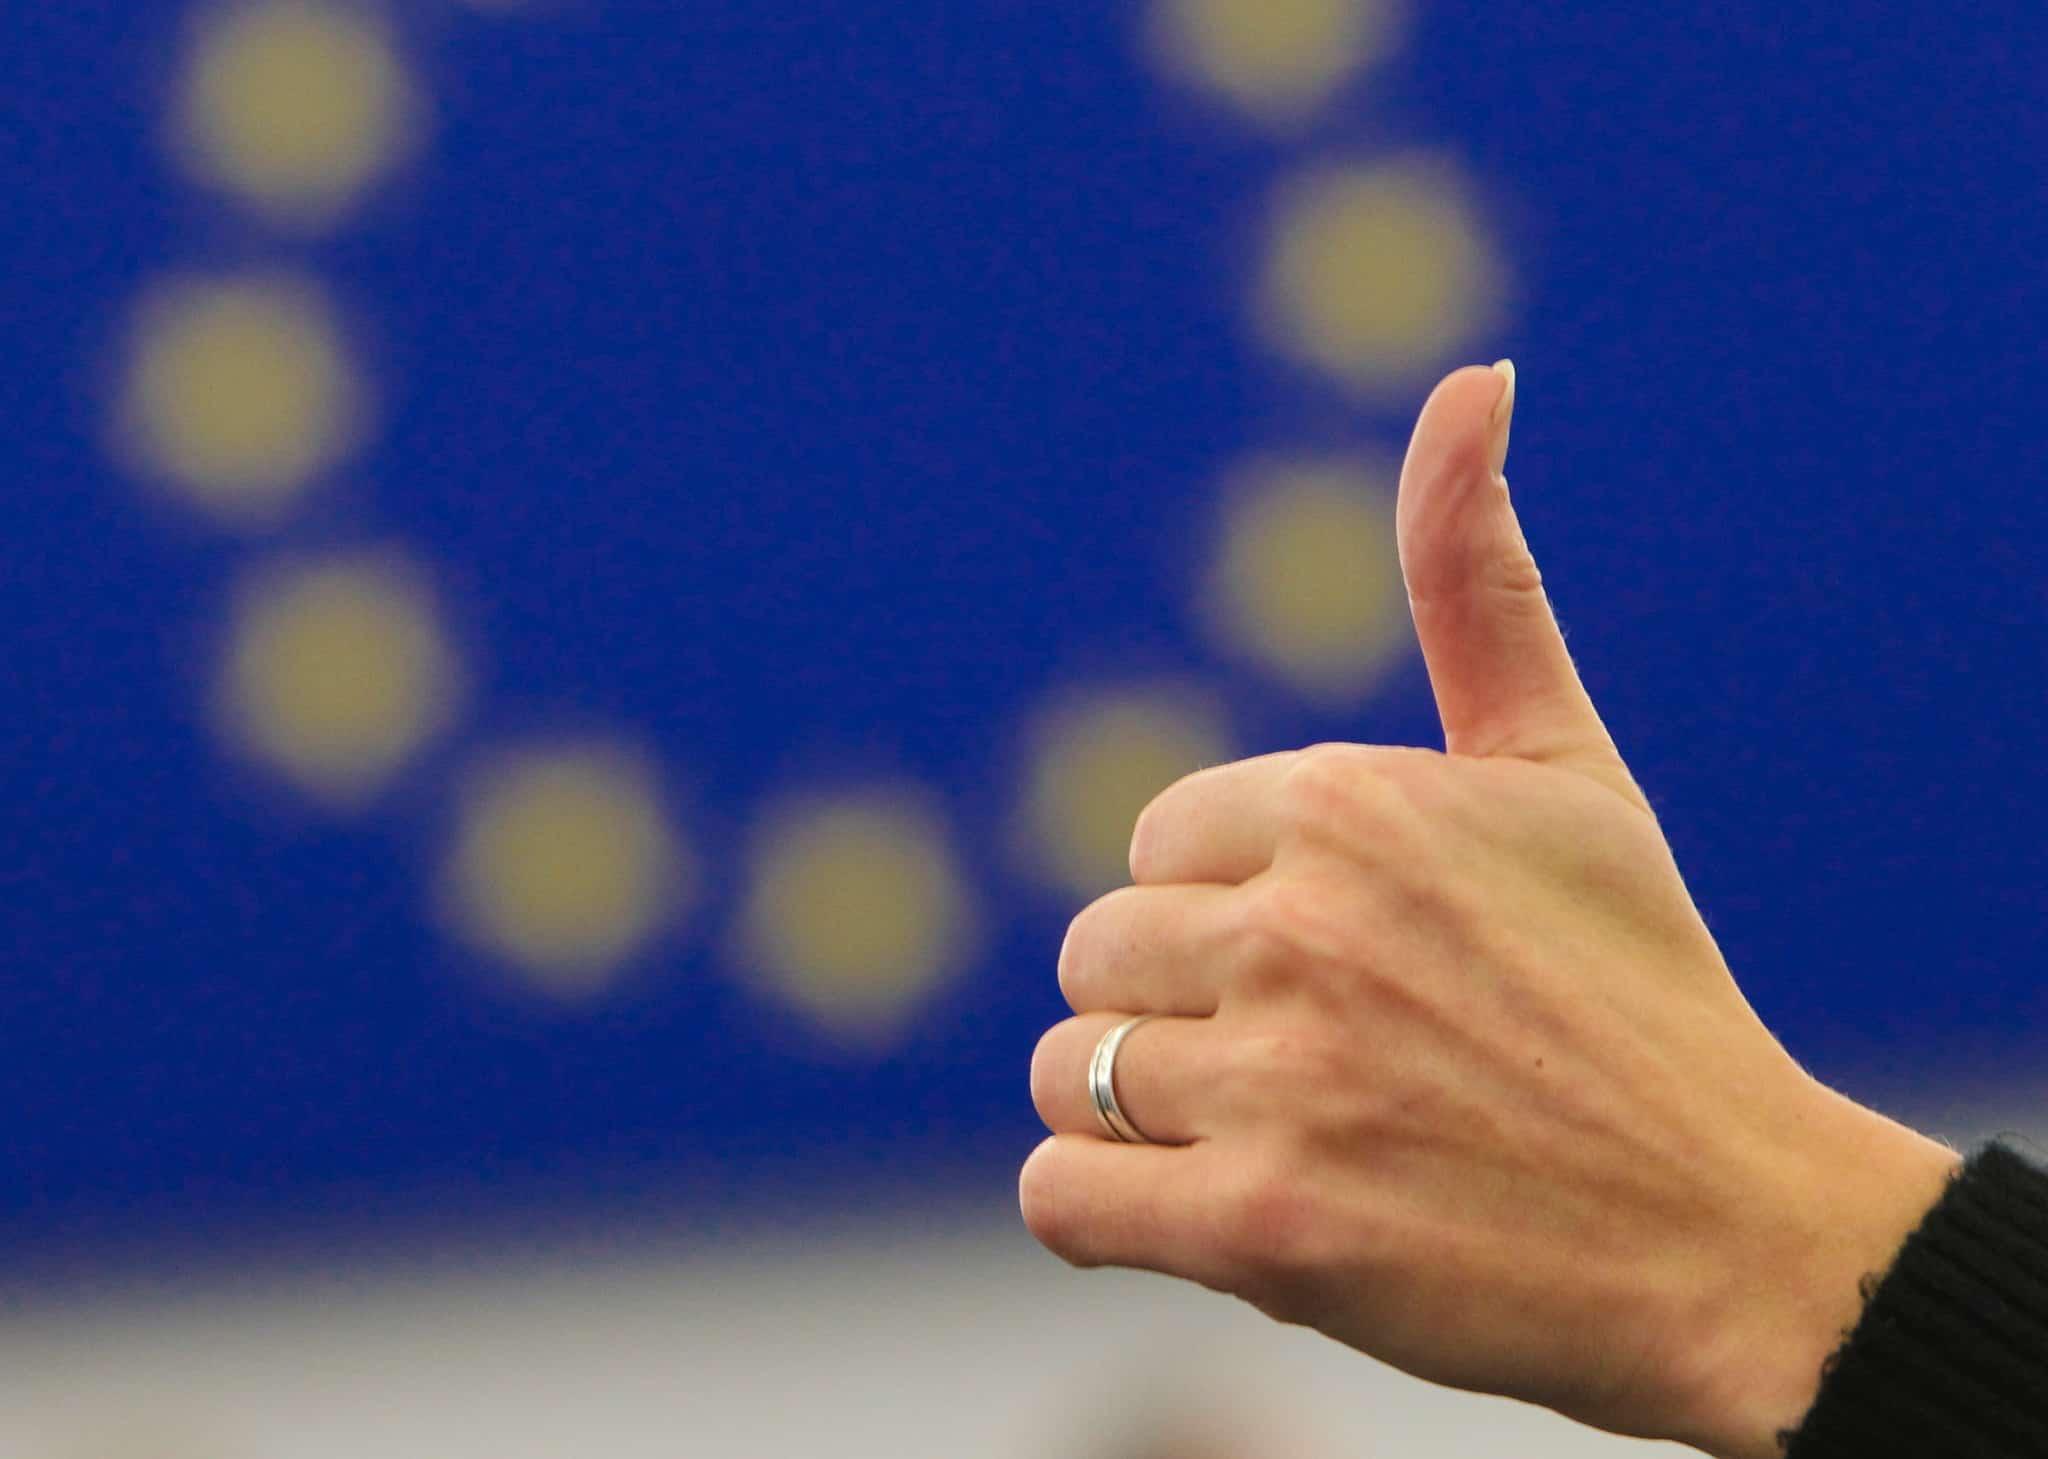 Det kritiserade vapenförslaget går igenom EU:s processer med rekordfart. Foto: Fred Marvaux